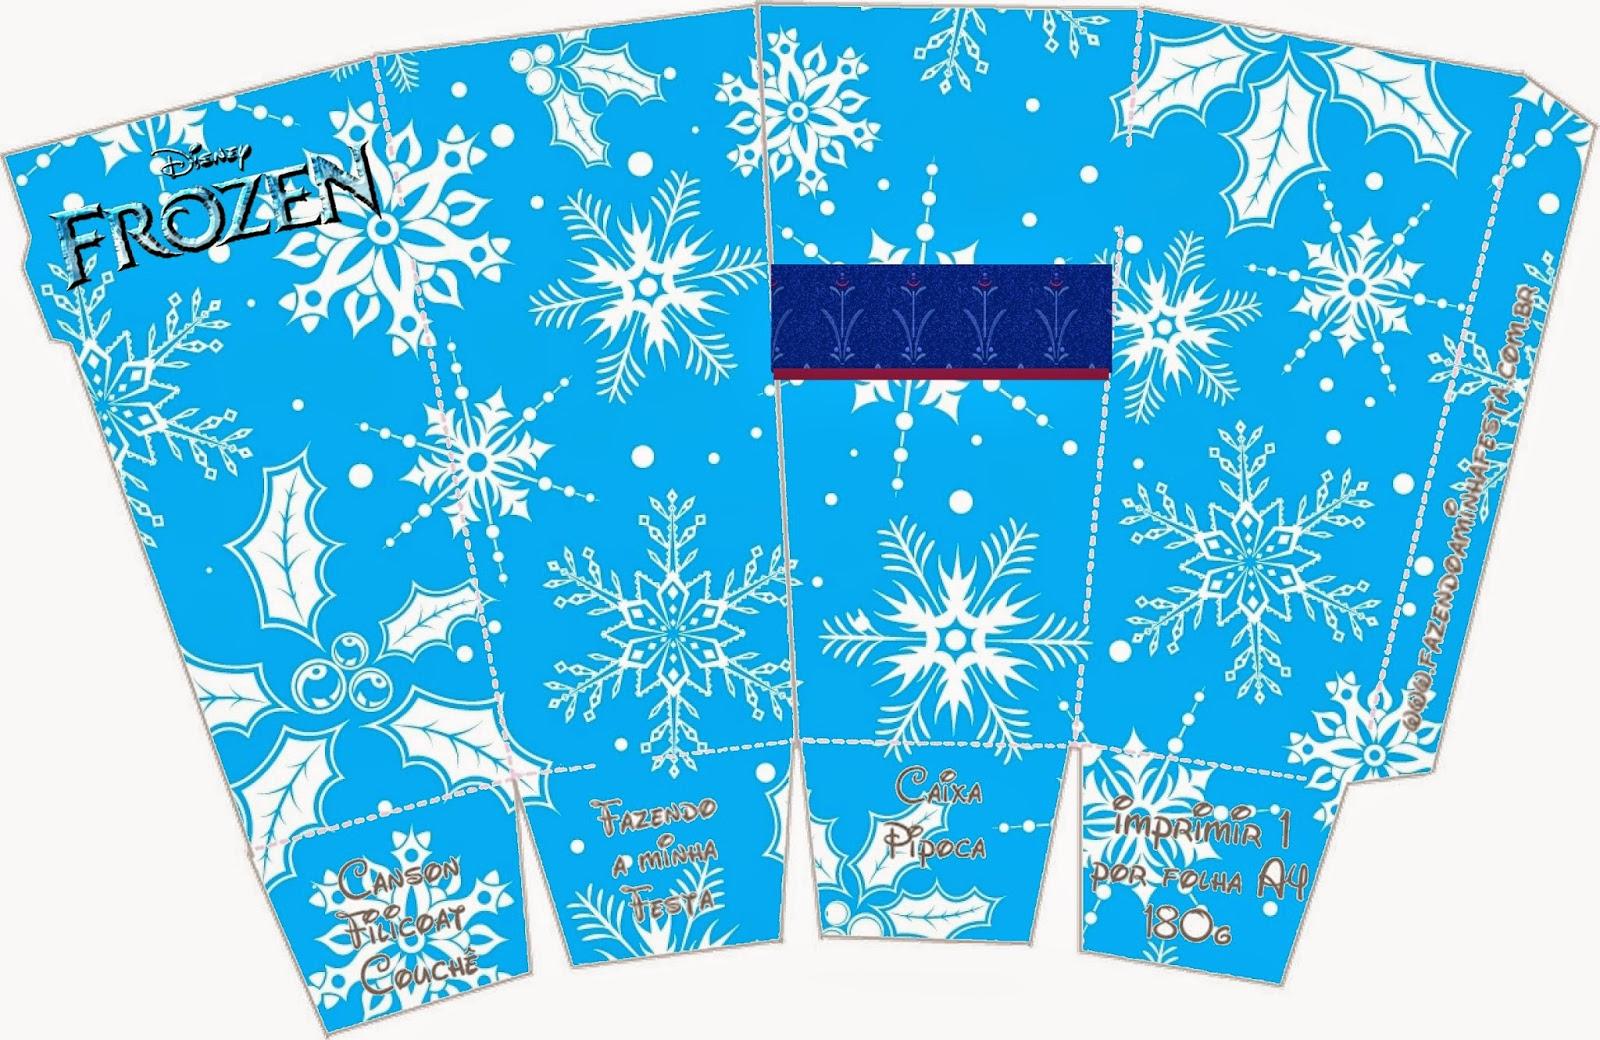 Frozen: Caja para Popcorn, para Imprimir Gratis.